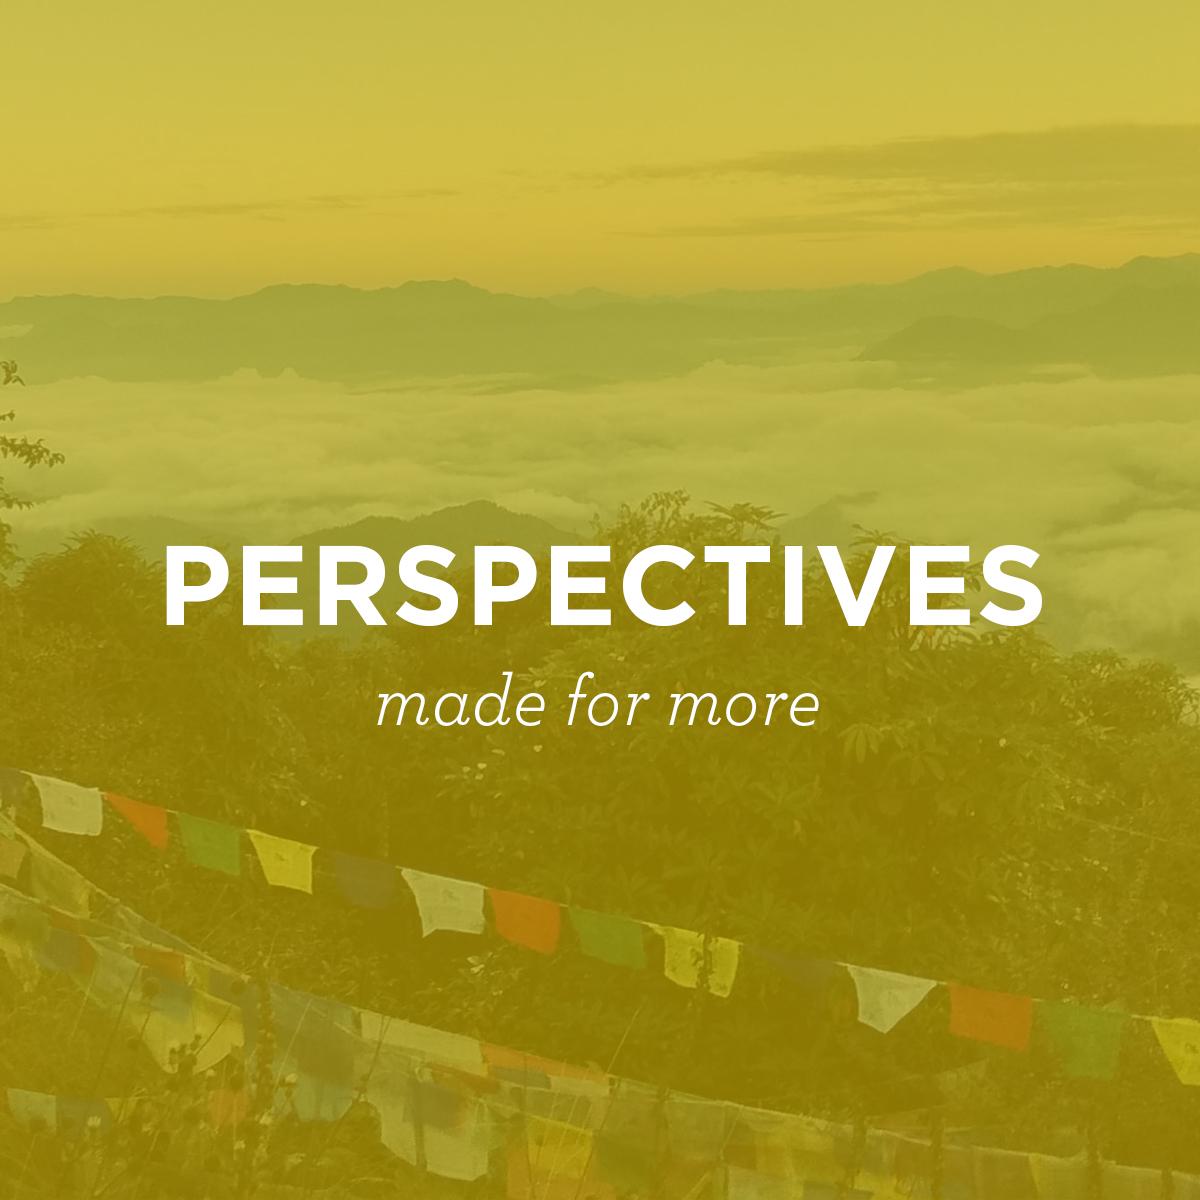 Perspectives-2.jpg